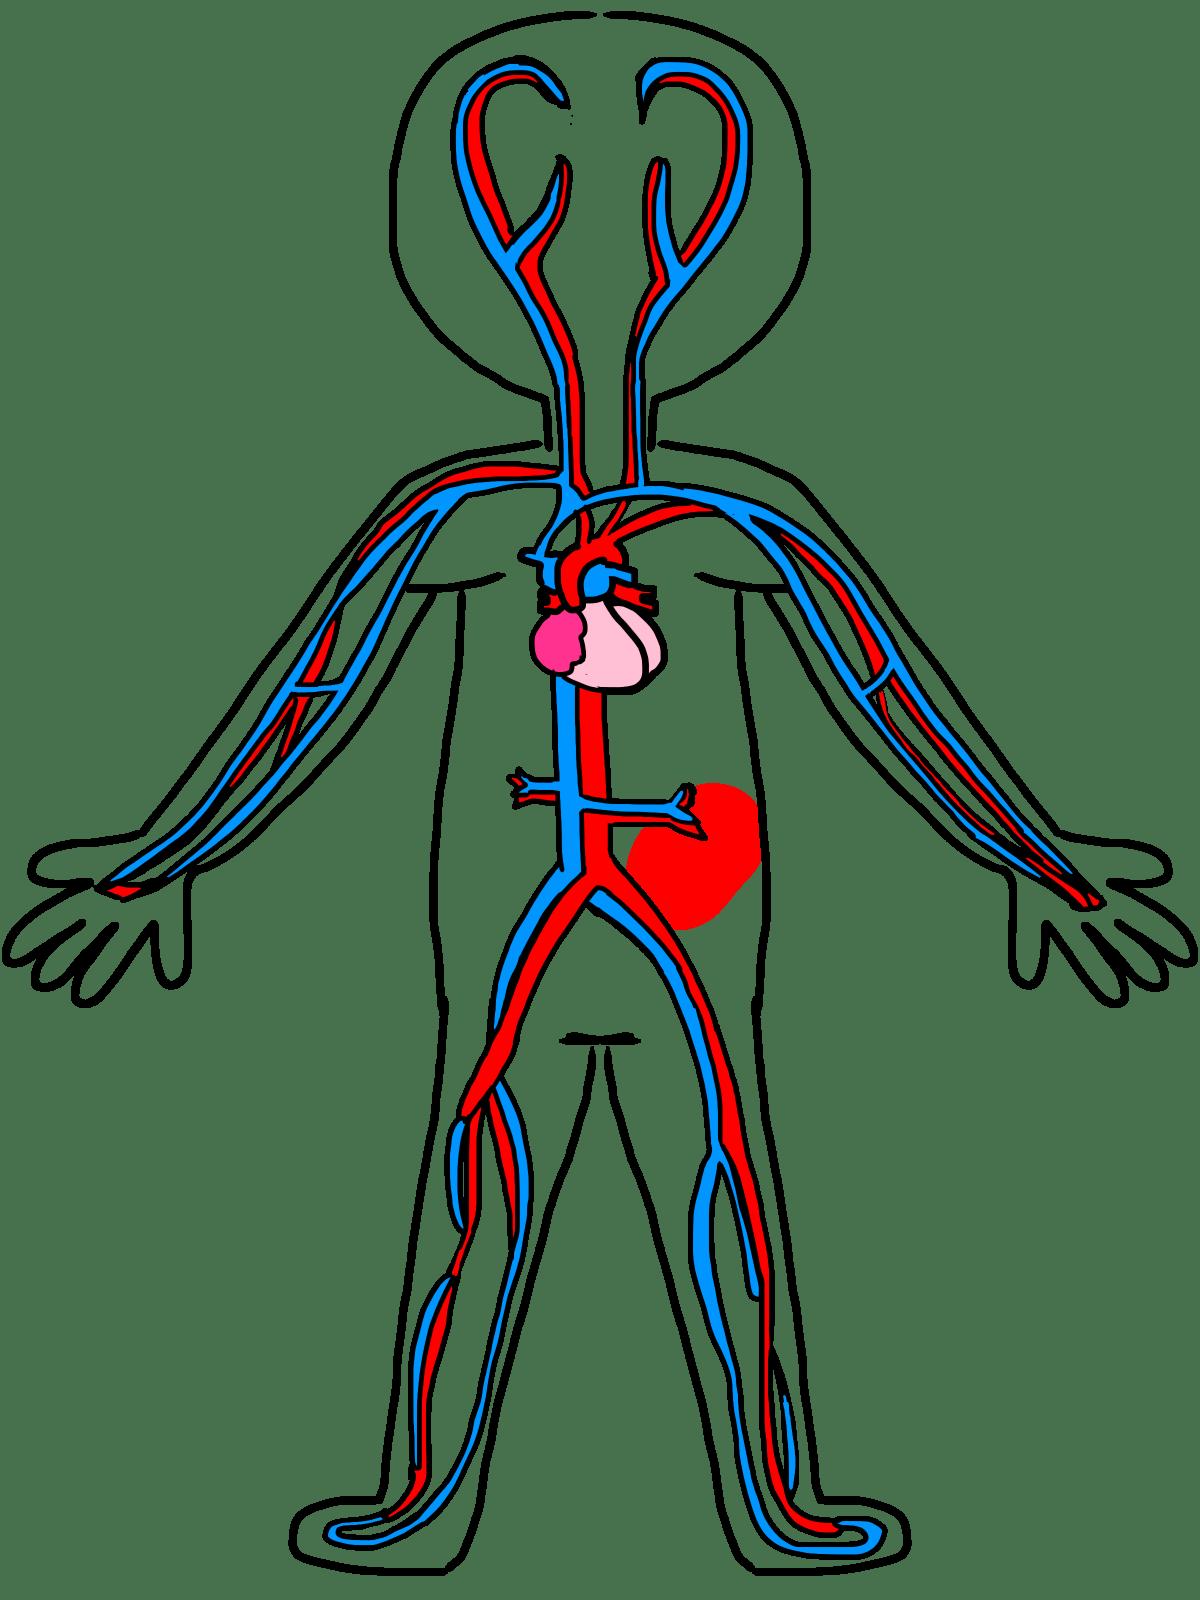 Circulatory System Diagram Unlabeled